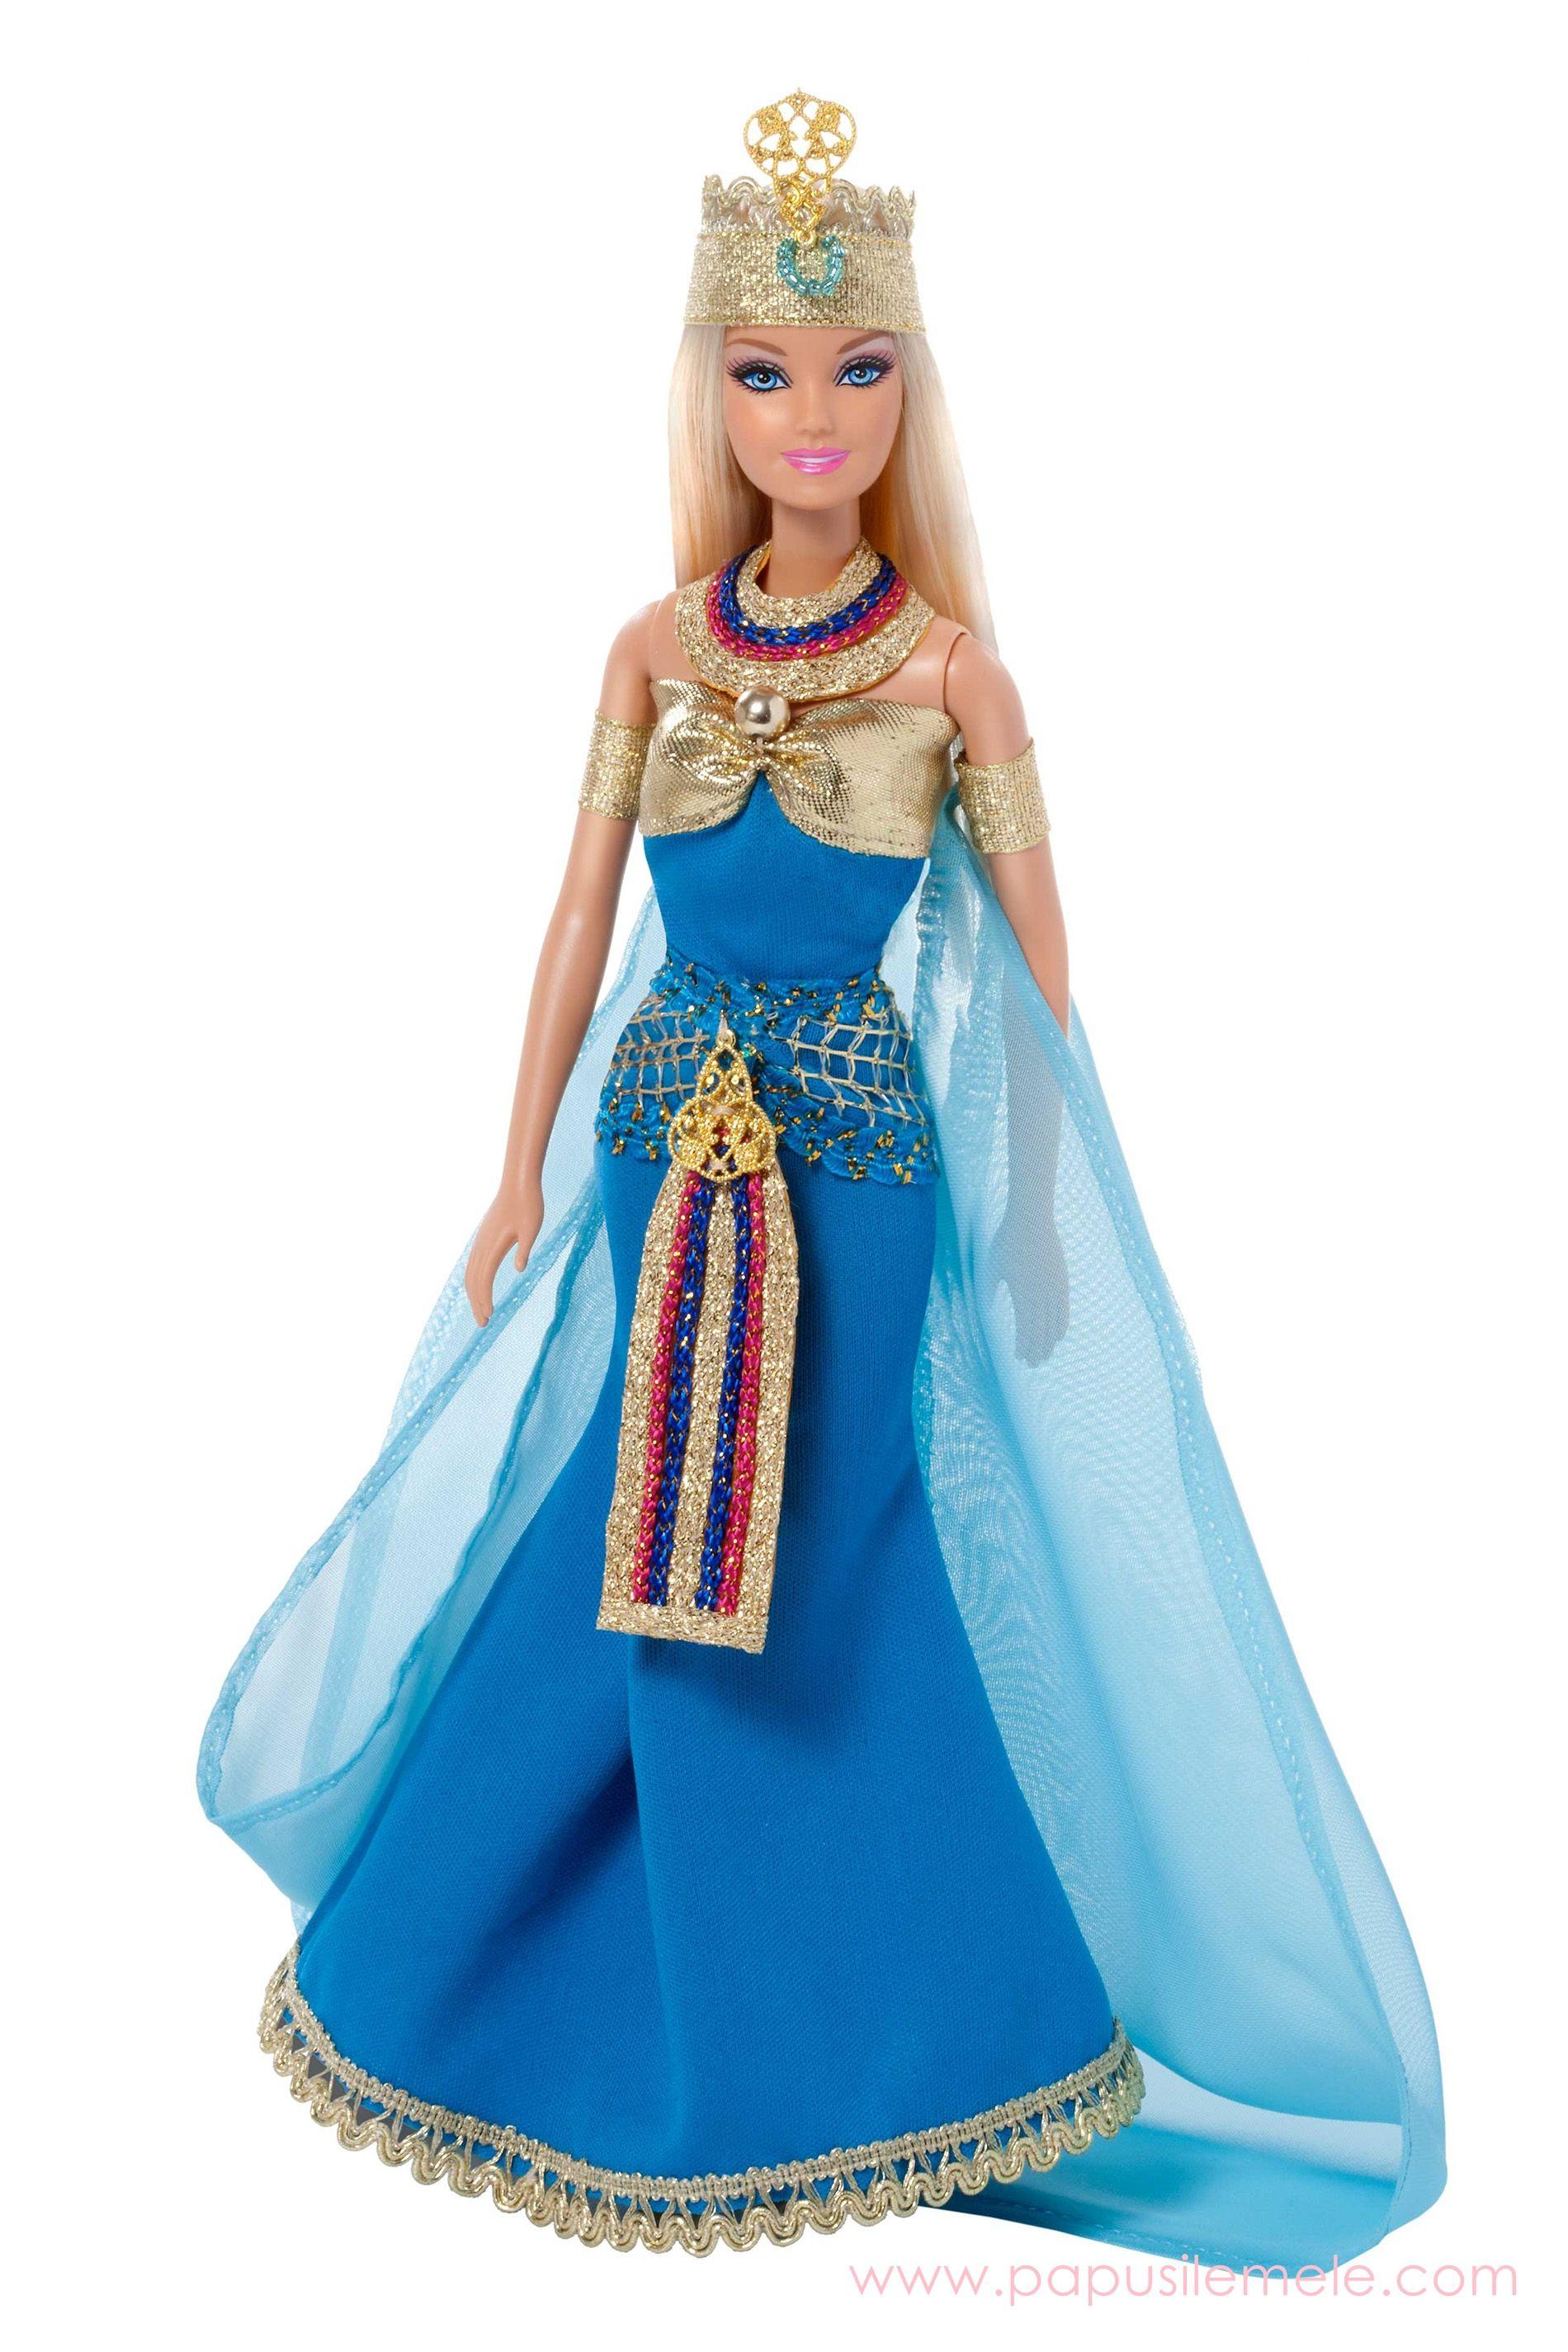 new barbie 2015 | Egypt | Ideas for the House | Pinterest